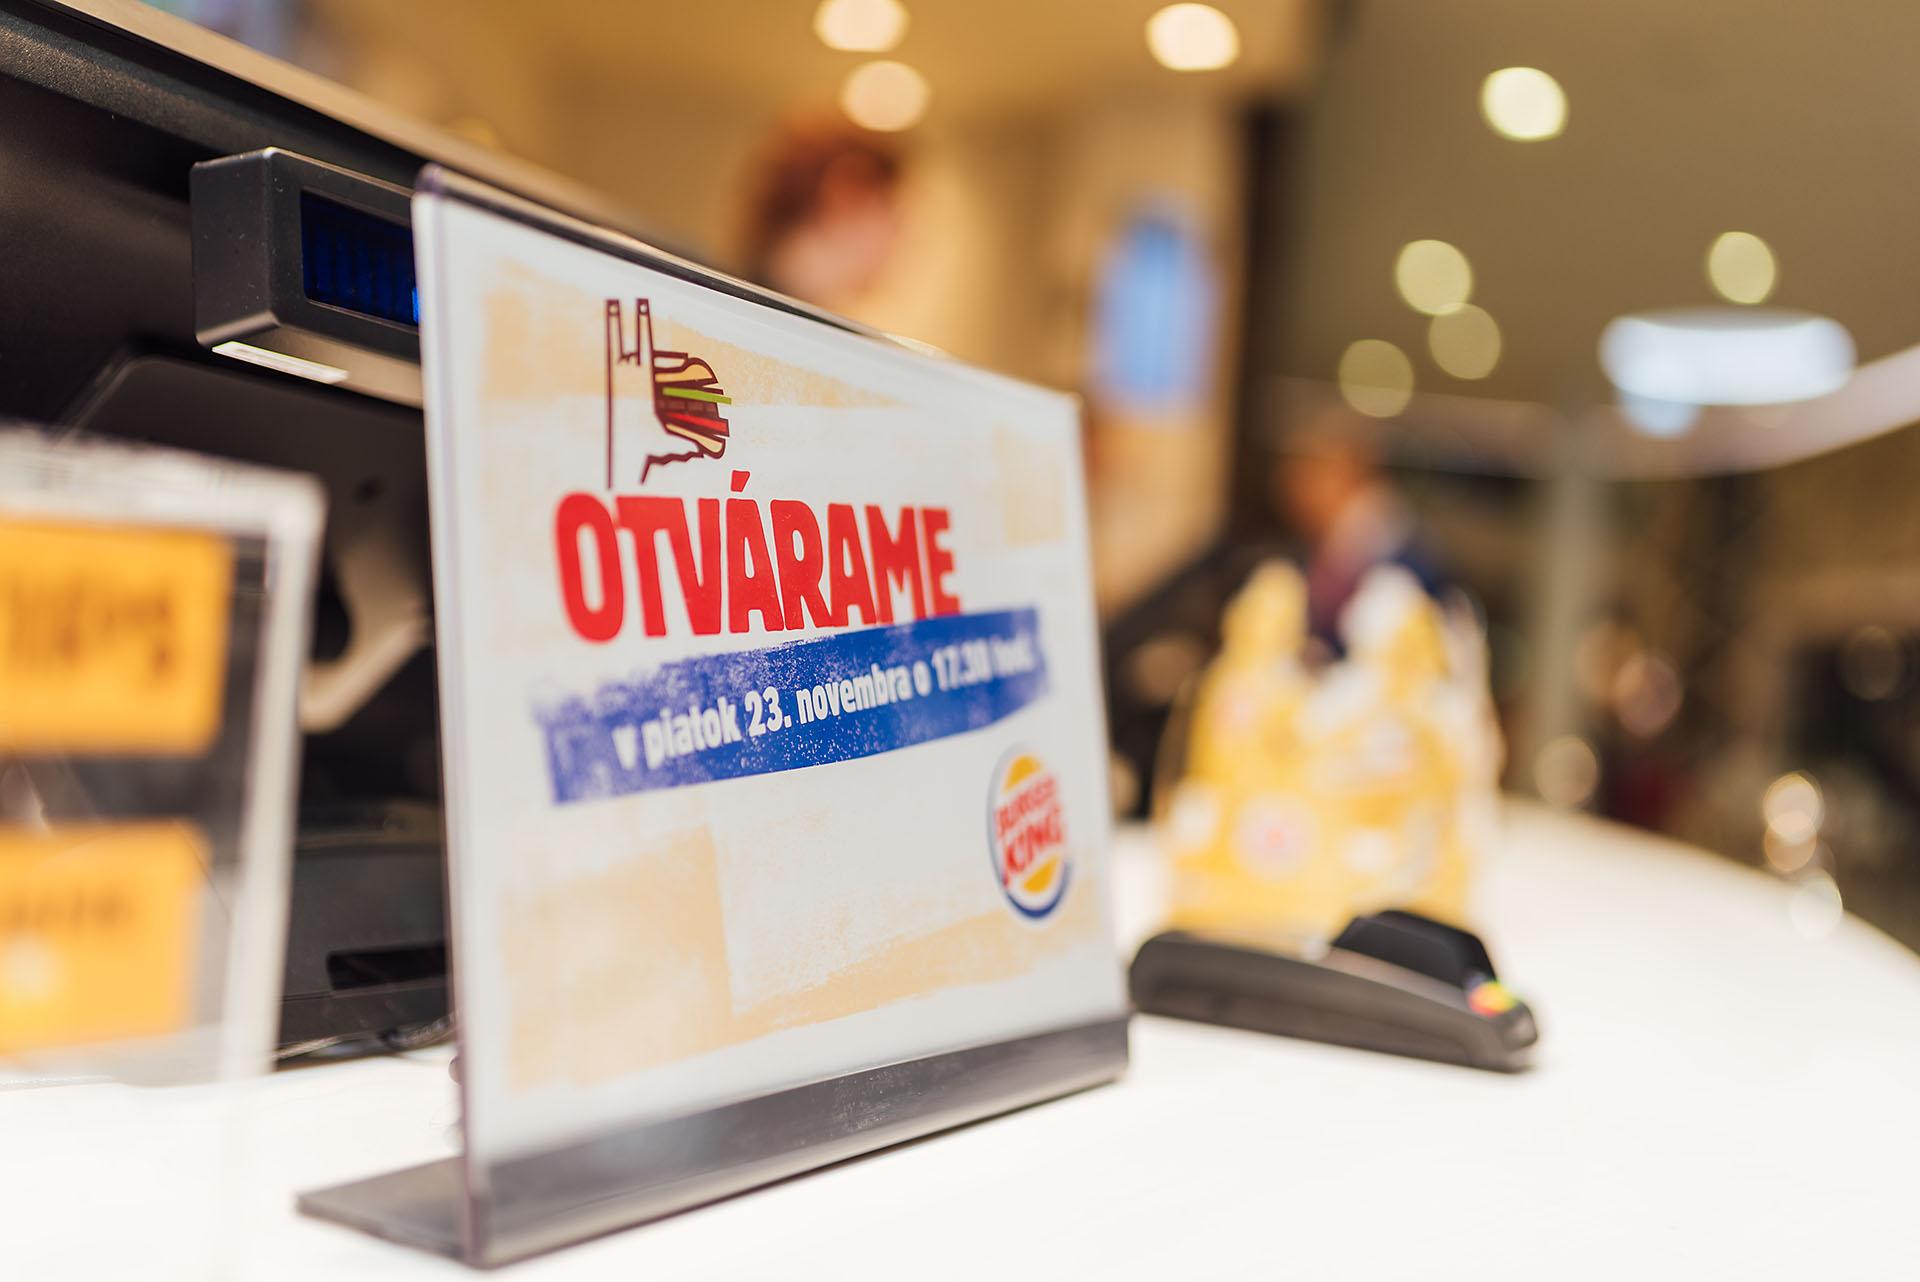 Otvorenie Burger King v Bory Mall, Bratislava - gastro, burger-king - eventovy fotograf